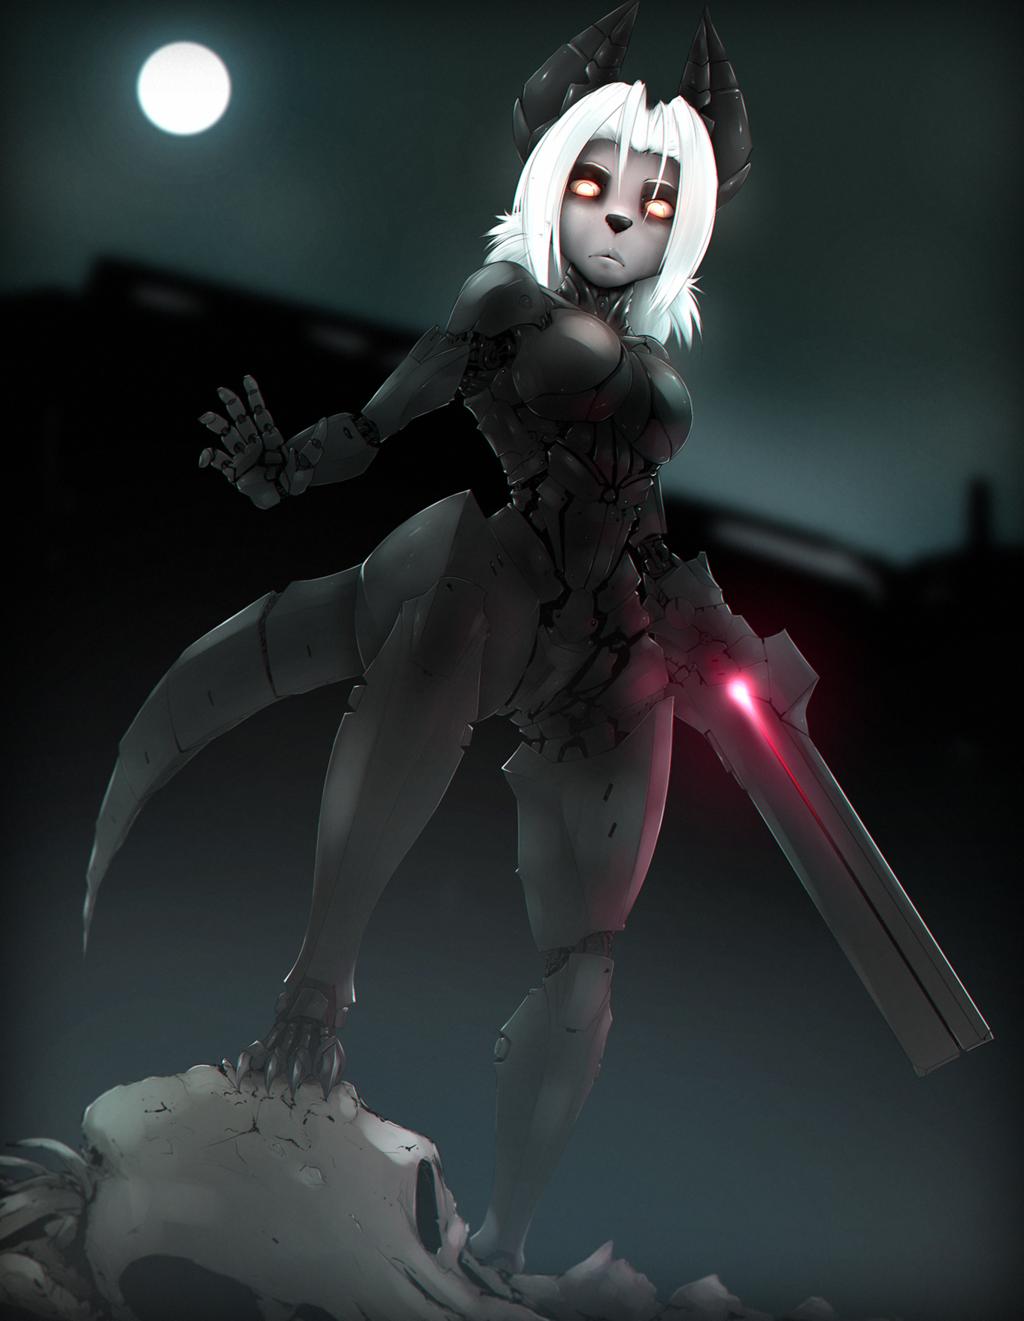 Most recent image: Cyborg jackal lady